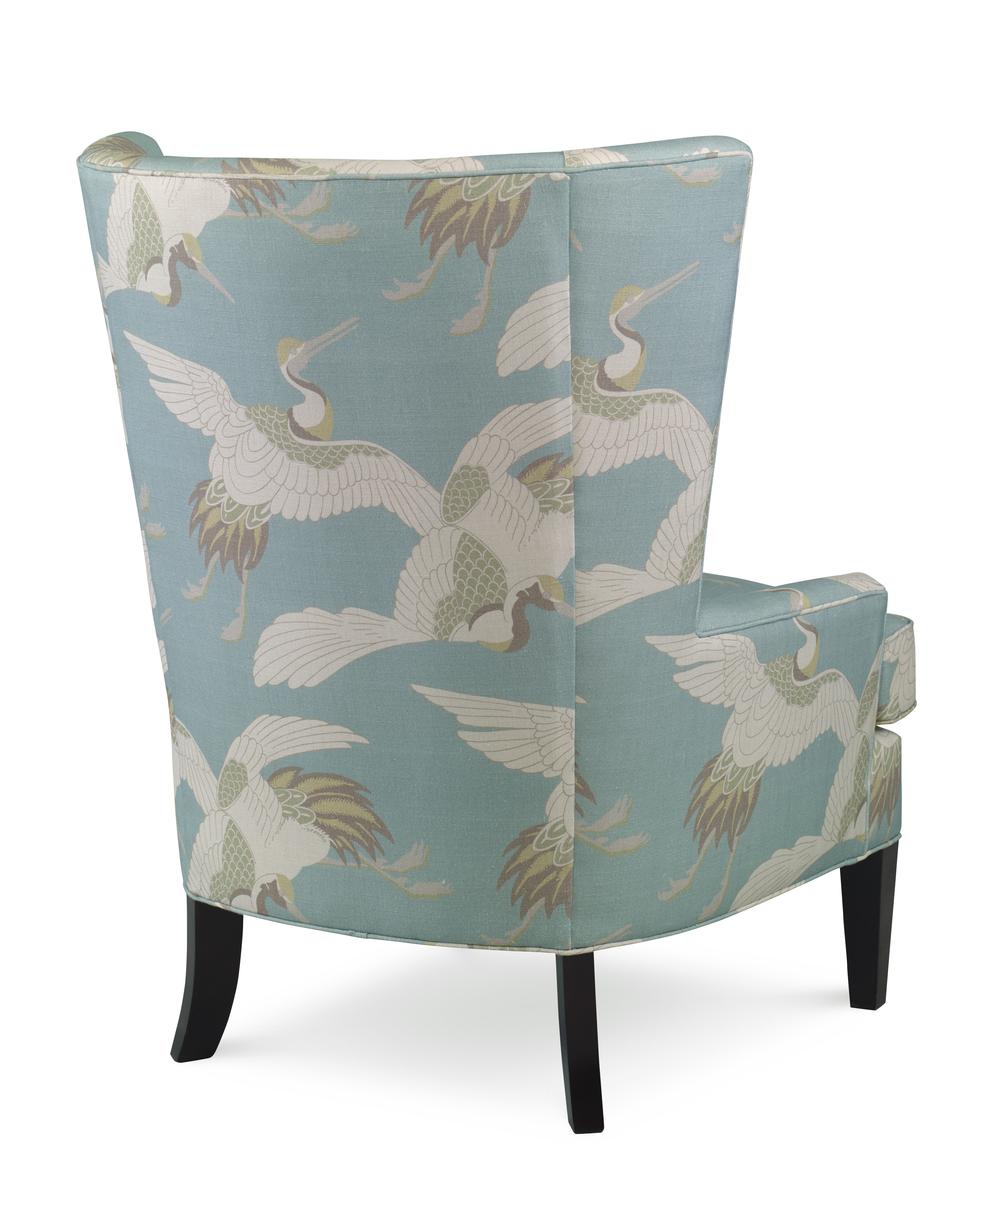 Century Furniture - Ridley Chair